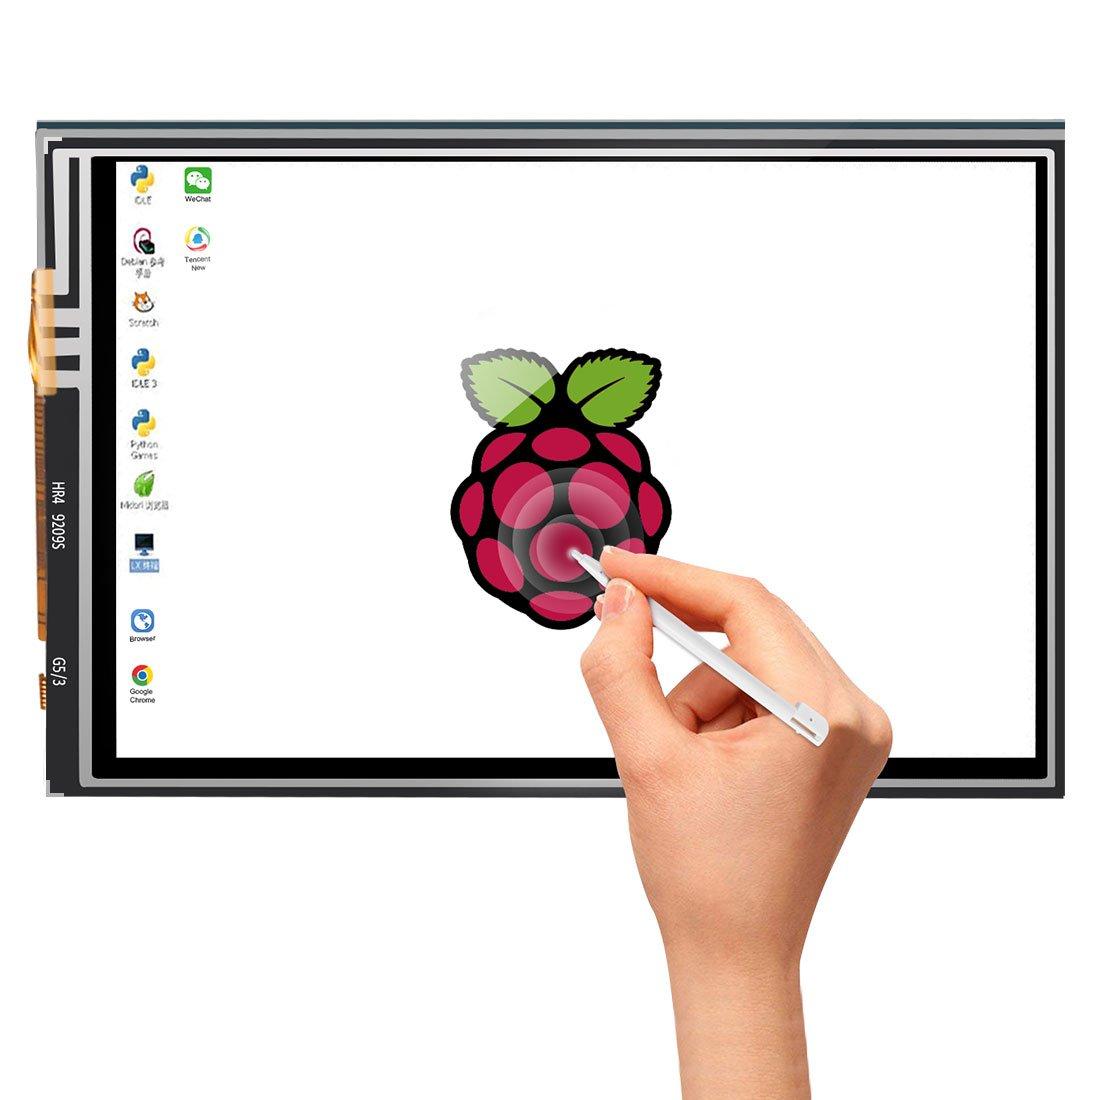 Dorhea Raspberry Pi 3 Model B TFT LCD Display Kit,3.5 inch 480x320 TFT Touch Screen Moudle with Protective Case Cooling Fan and Heatsinks for Raspberry Pi 3 B+,Pi 3 B, Pi 2, Pi Zero, Pi B+ by Dorhea (Image #3)